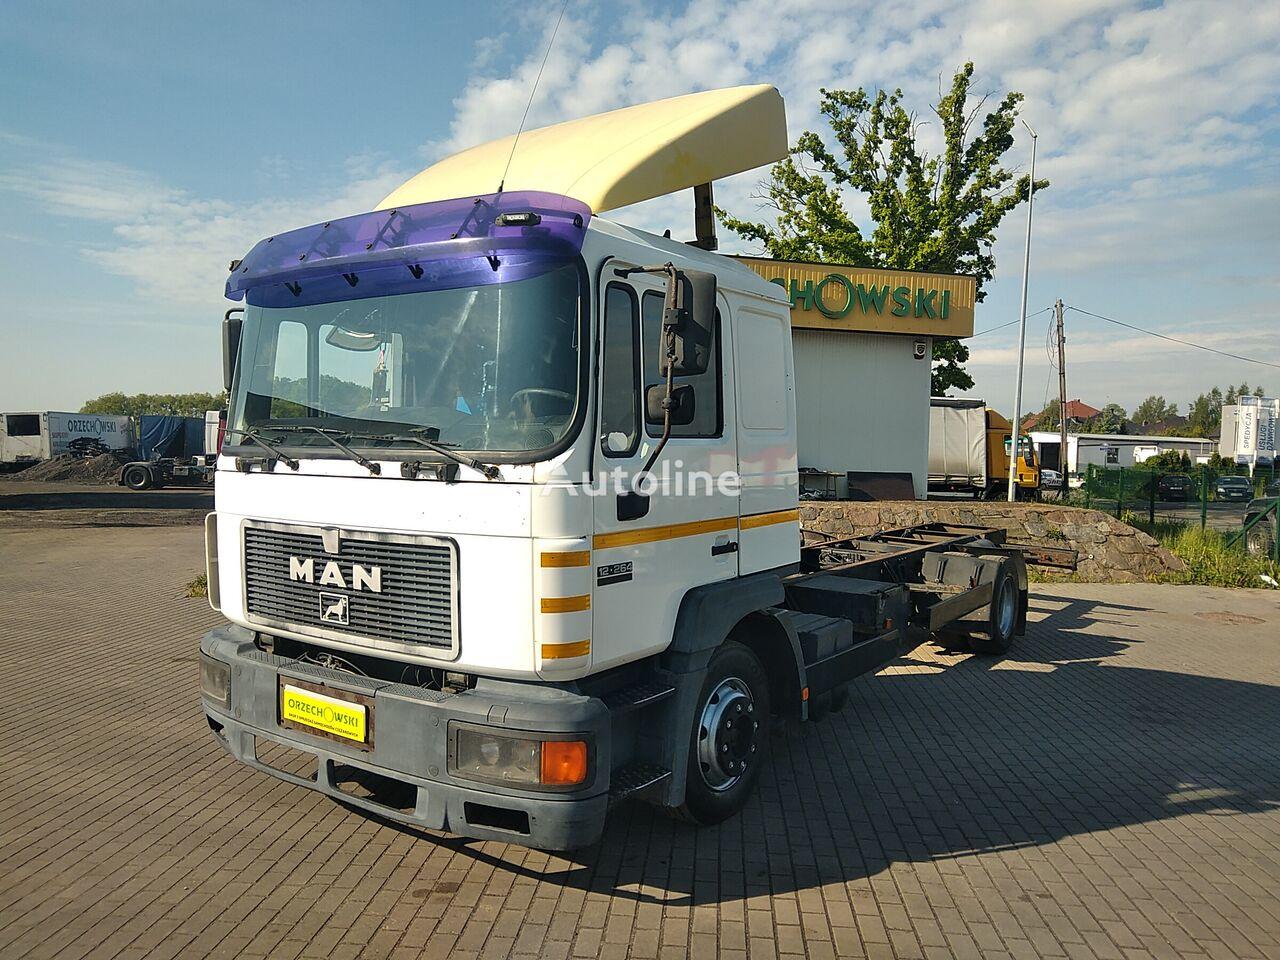 MAN 14.264 camión chasis